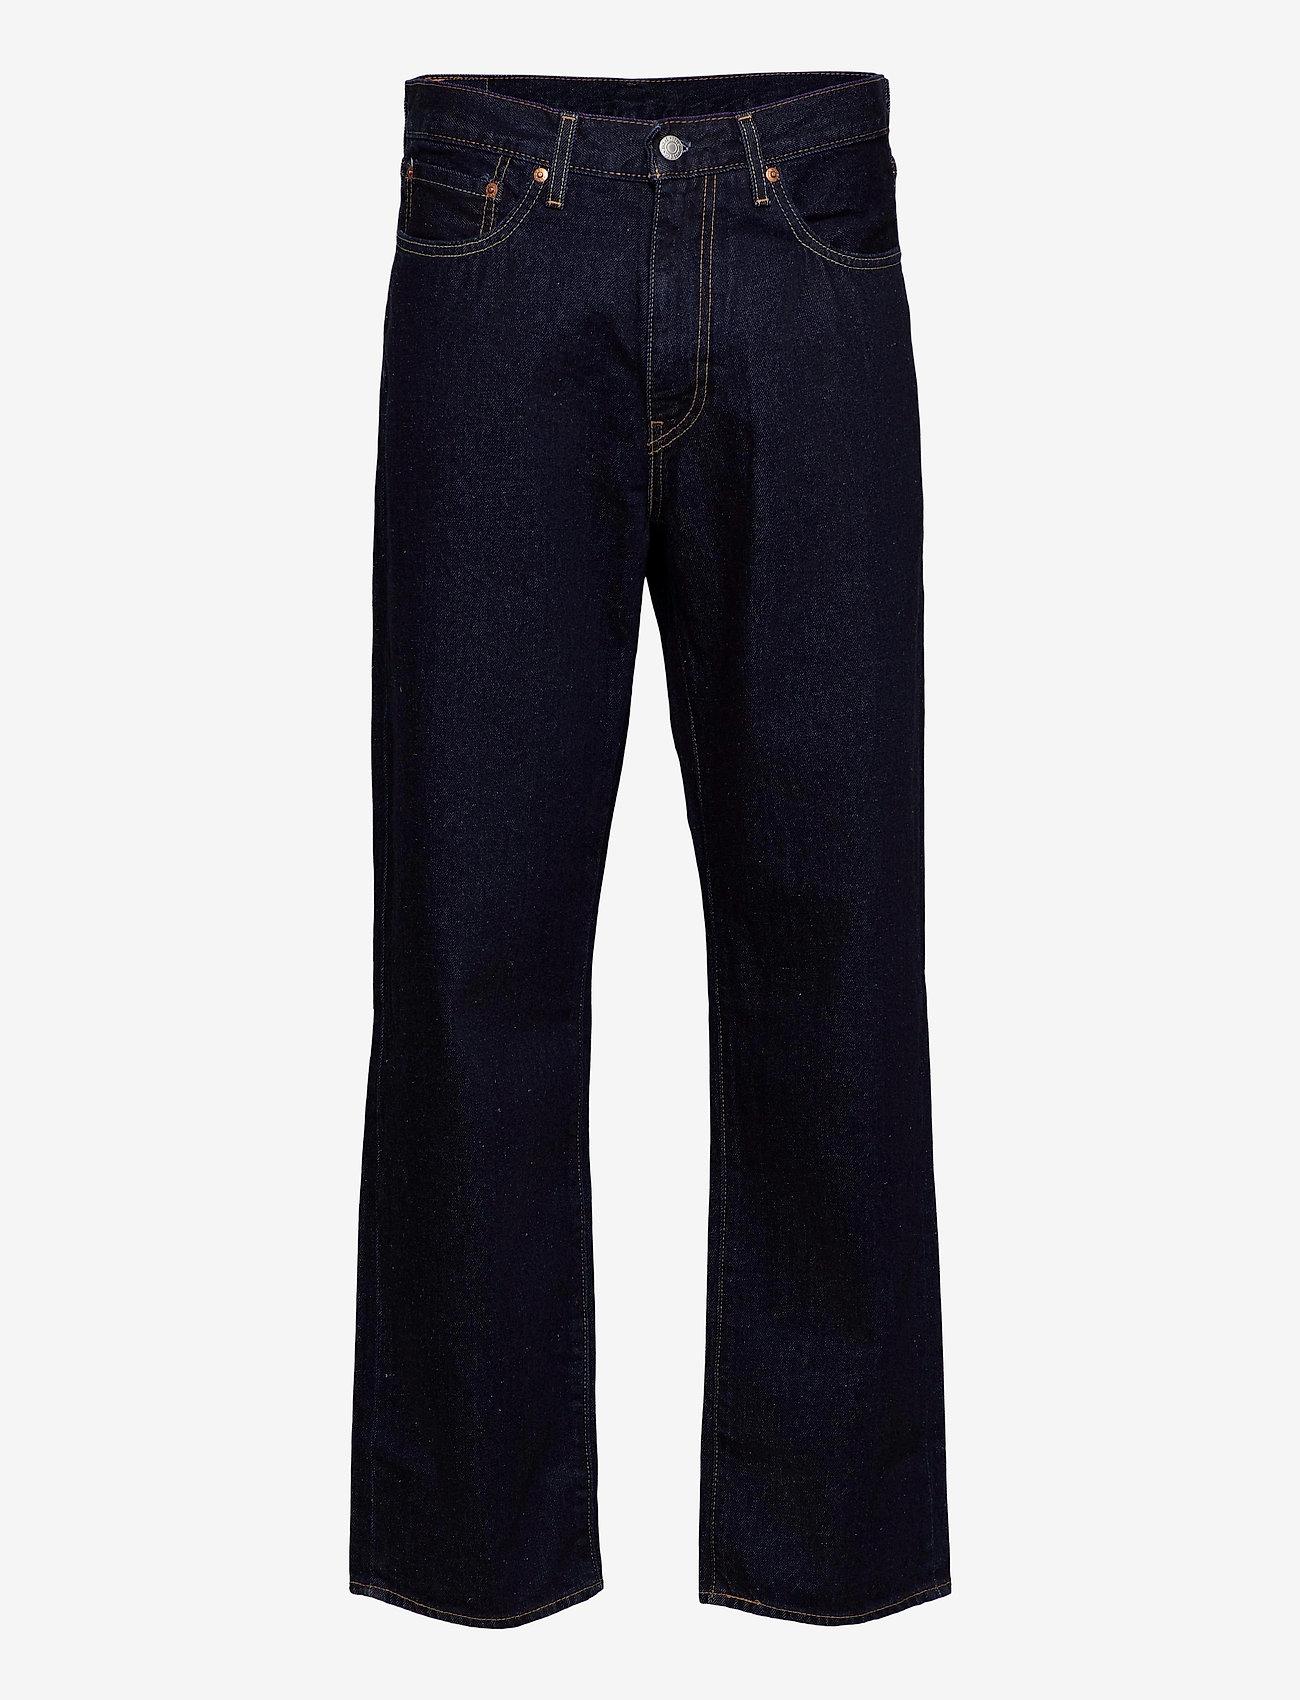 LEVI´S Men - STAY LOOSE DENIM SPOTTED ROAD - regular jeans - dark indigo - flat finish - 0